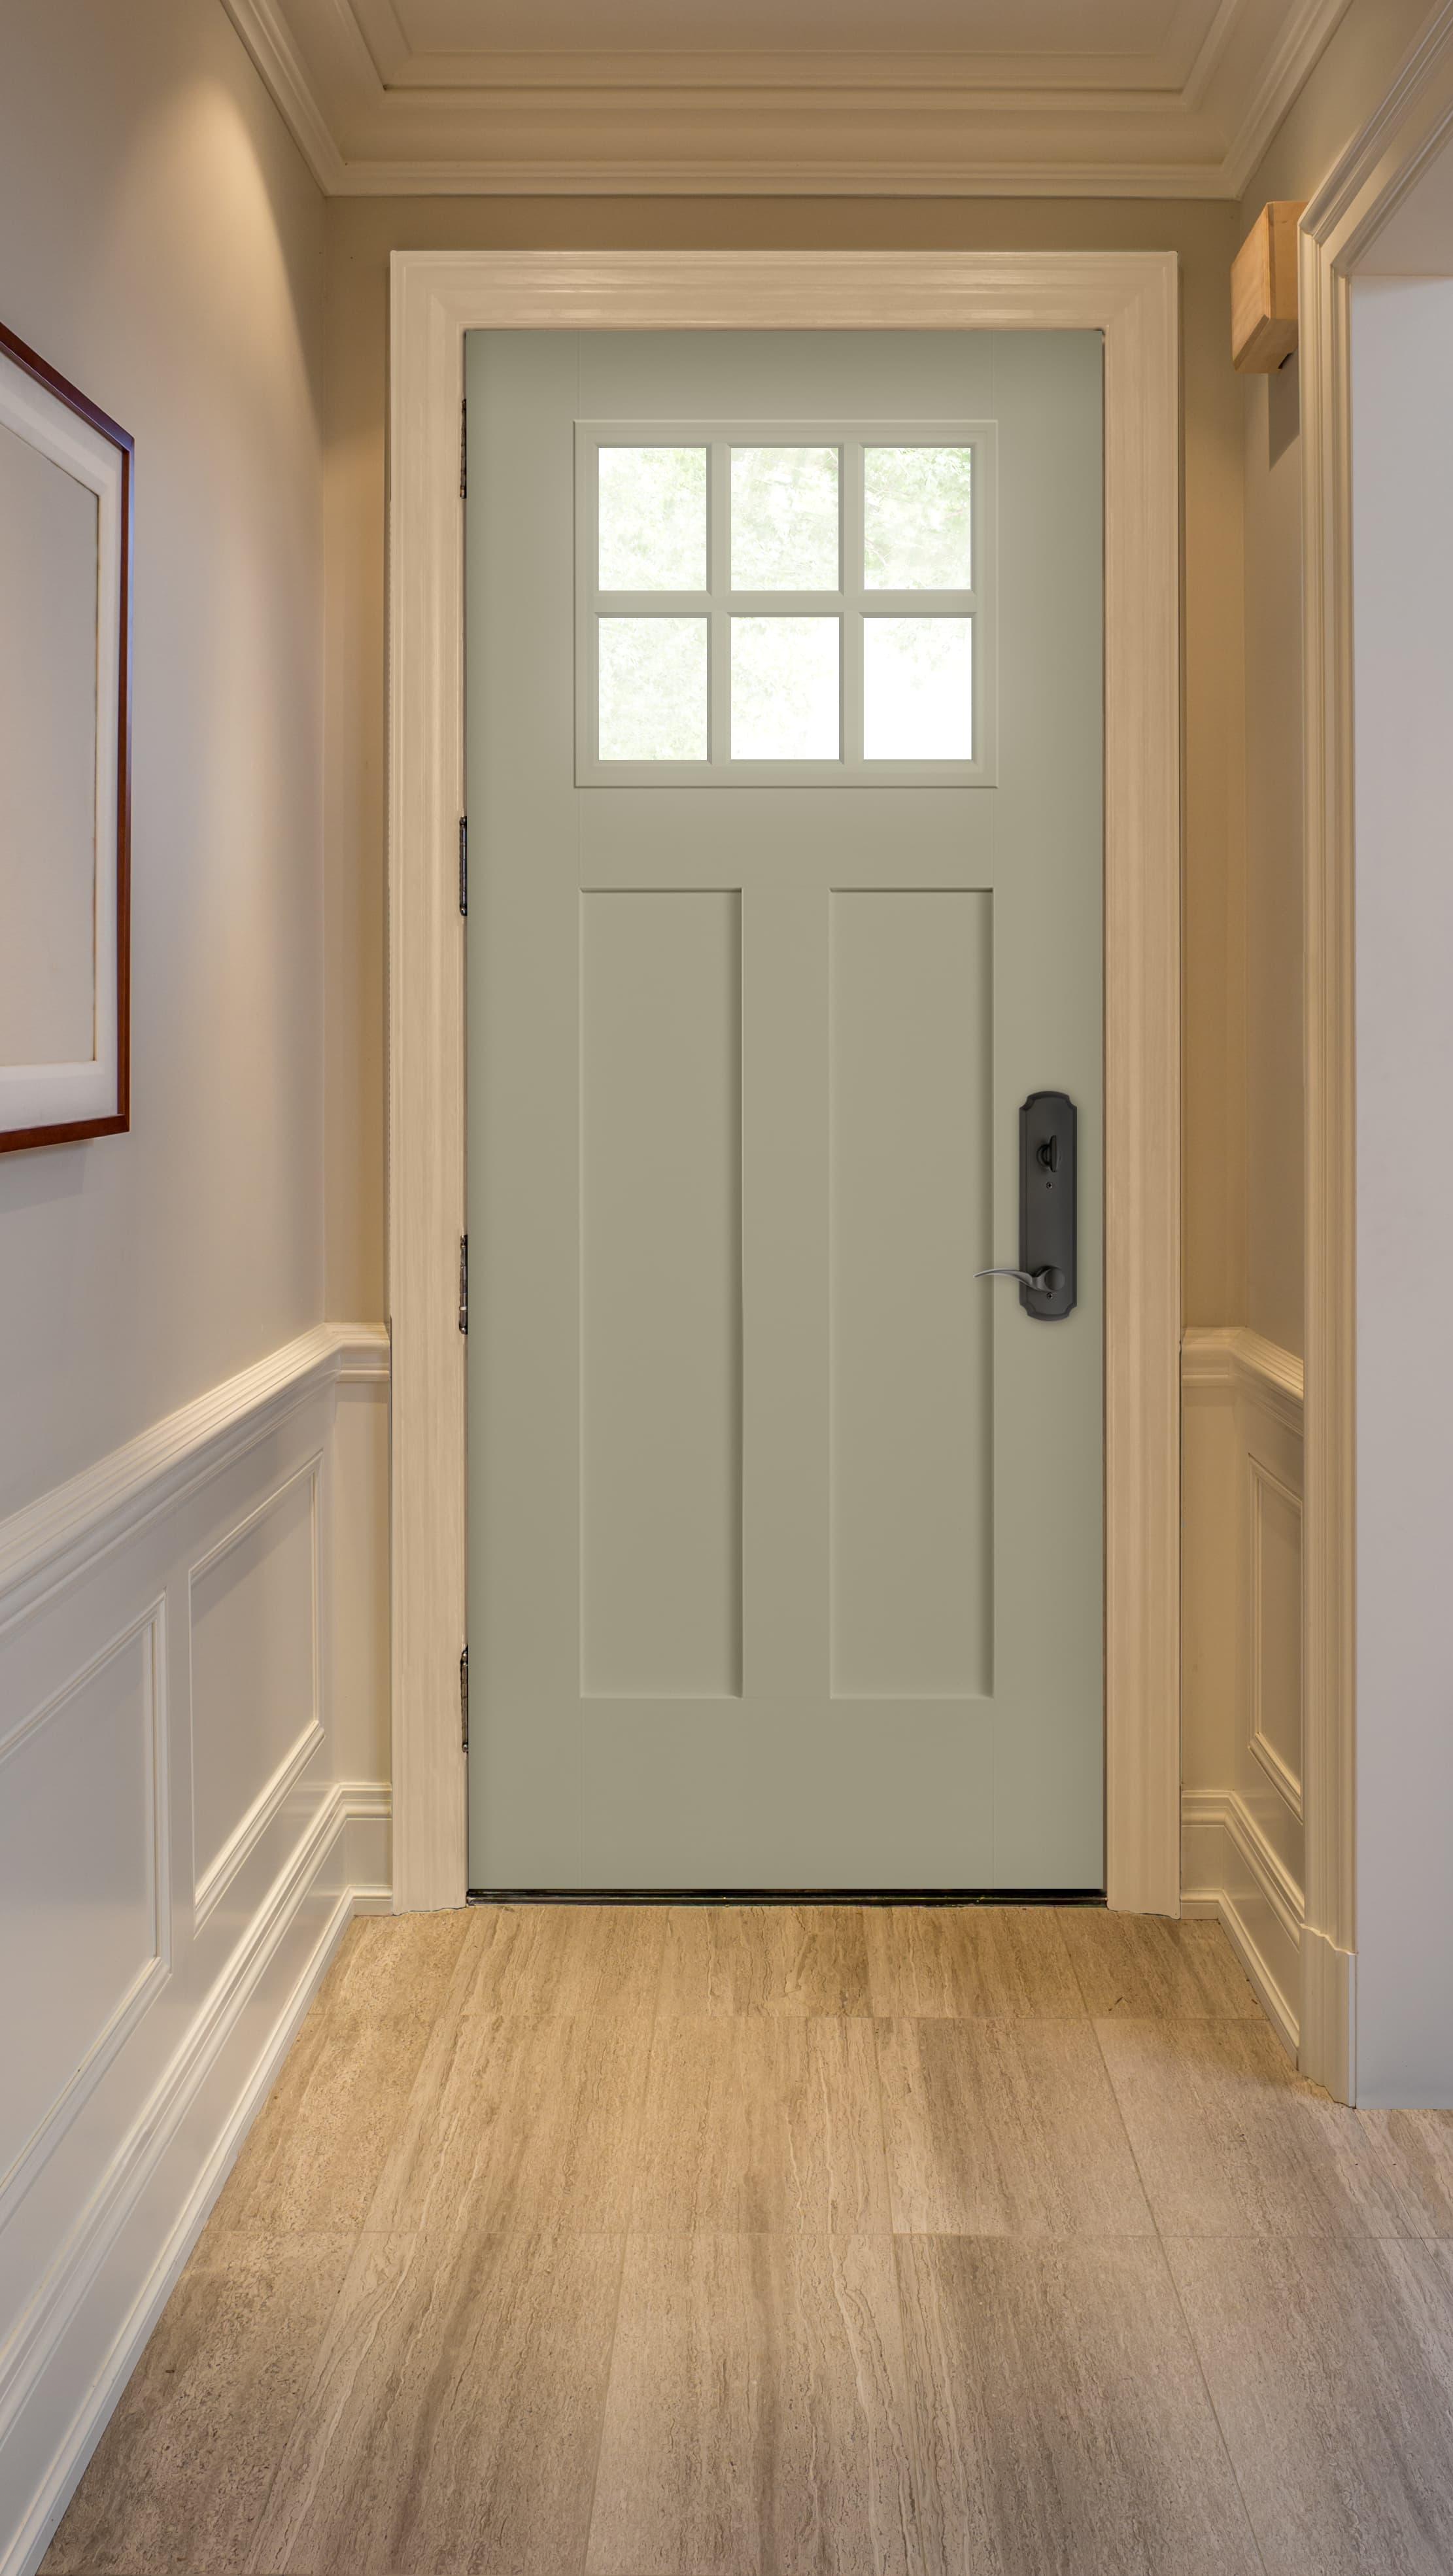 Blue craftsman front door lights up neutral color entryway